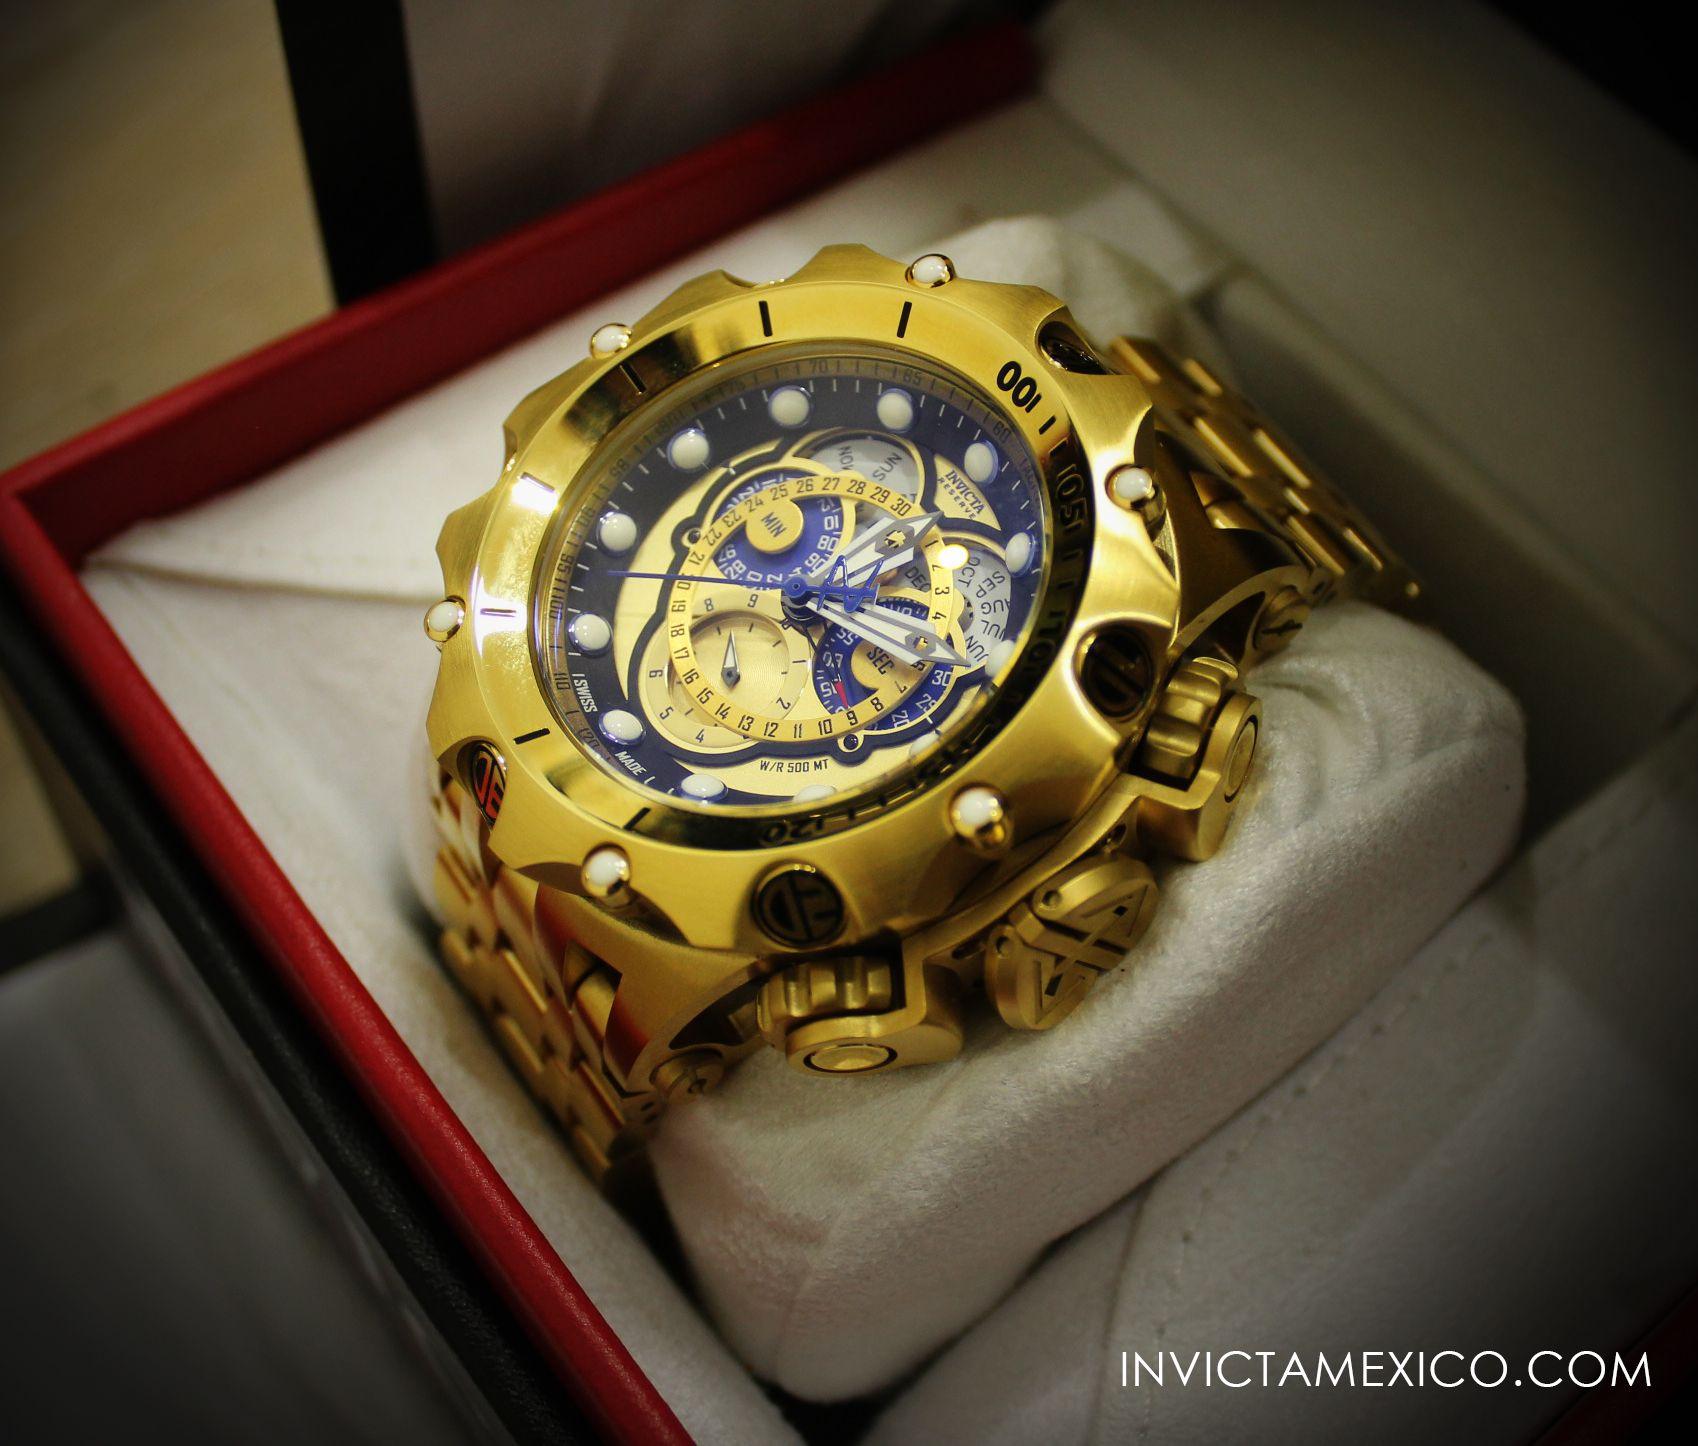 mejor baratas 3e3a3 534e0 Pin de frederick en relojes | Reloj invicta, Reloj y Acero ...